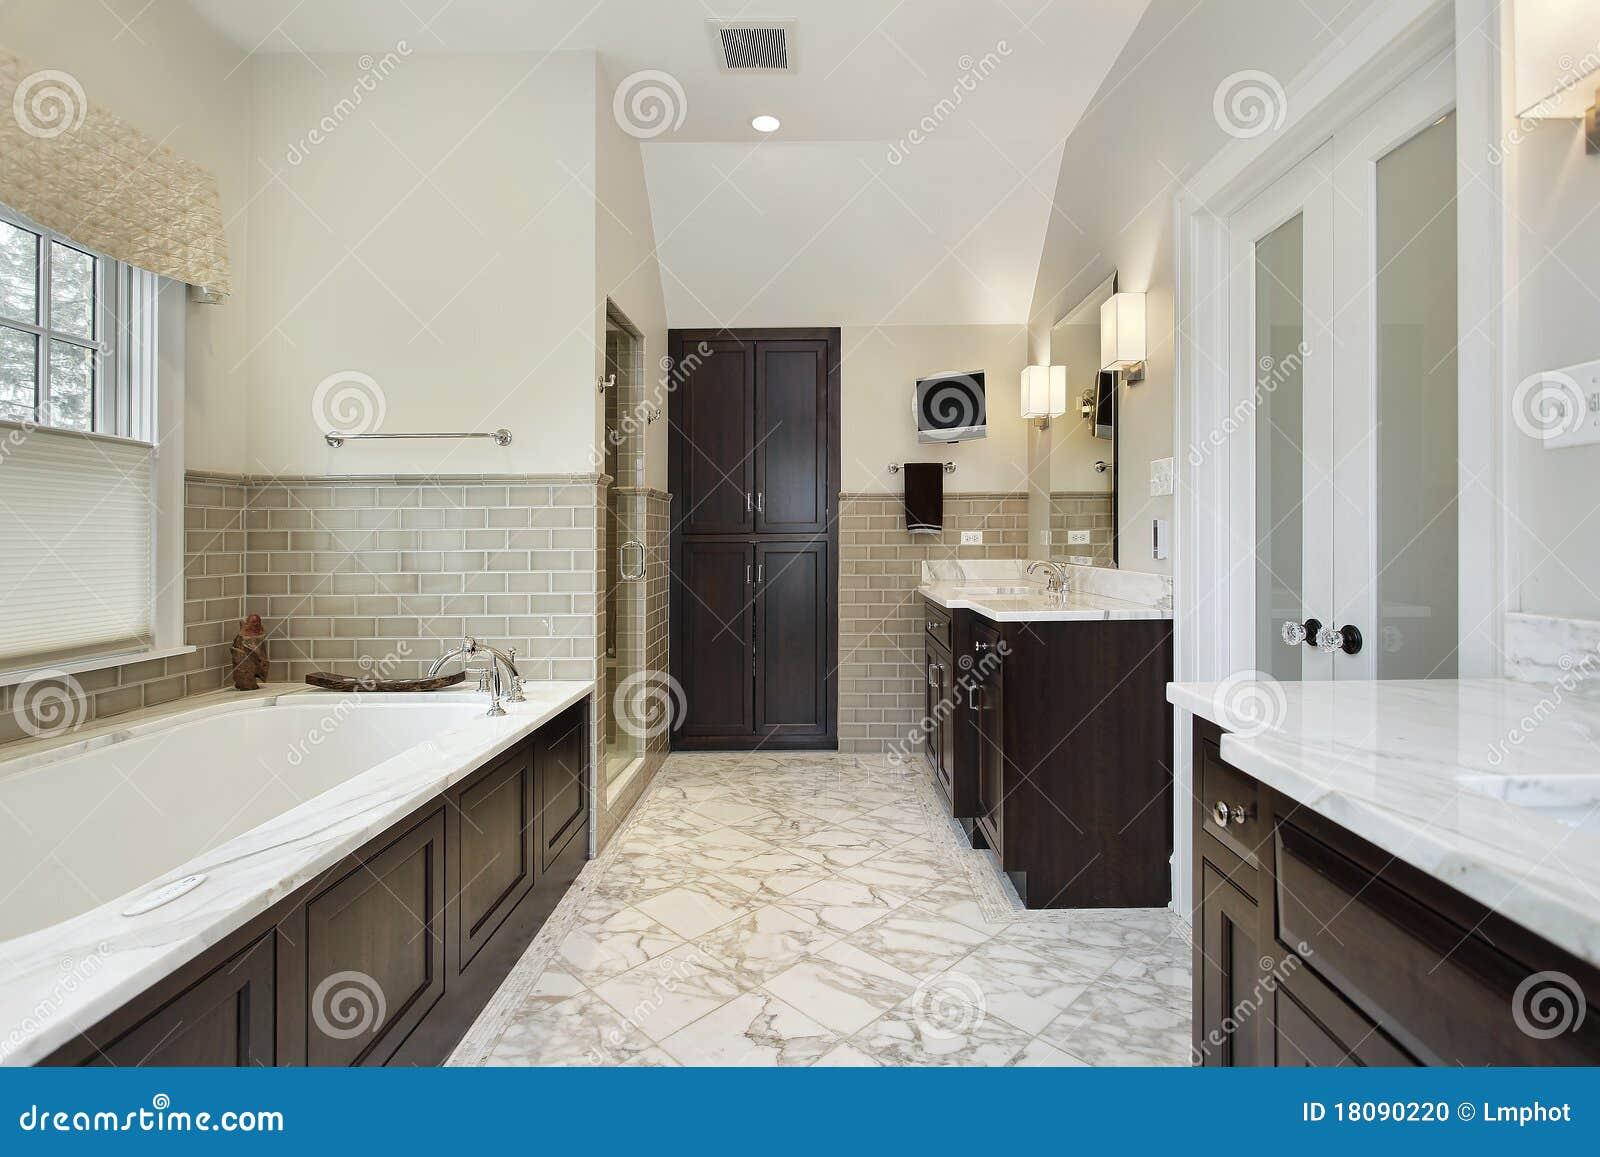 Master Bathroom Dark Cabinets master bath with dark wood cabinetry stock photo - image: 18090220